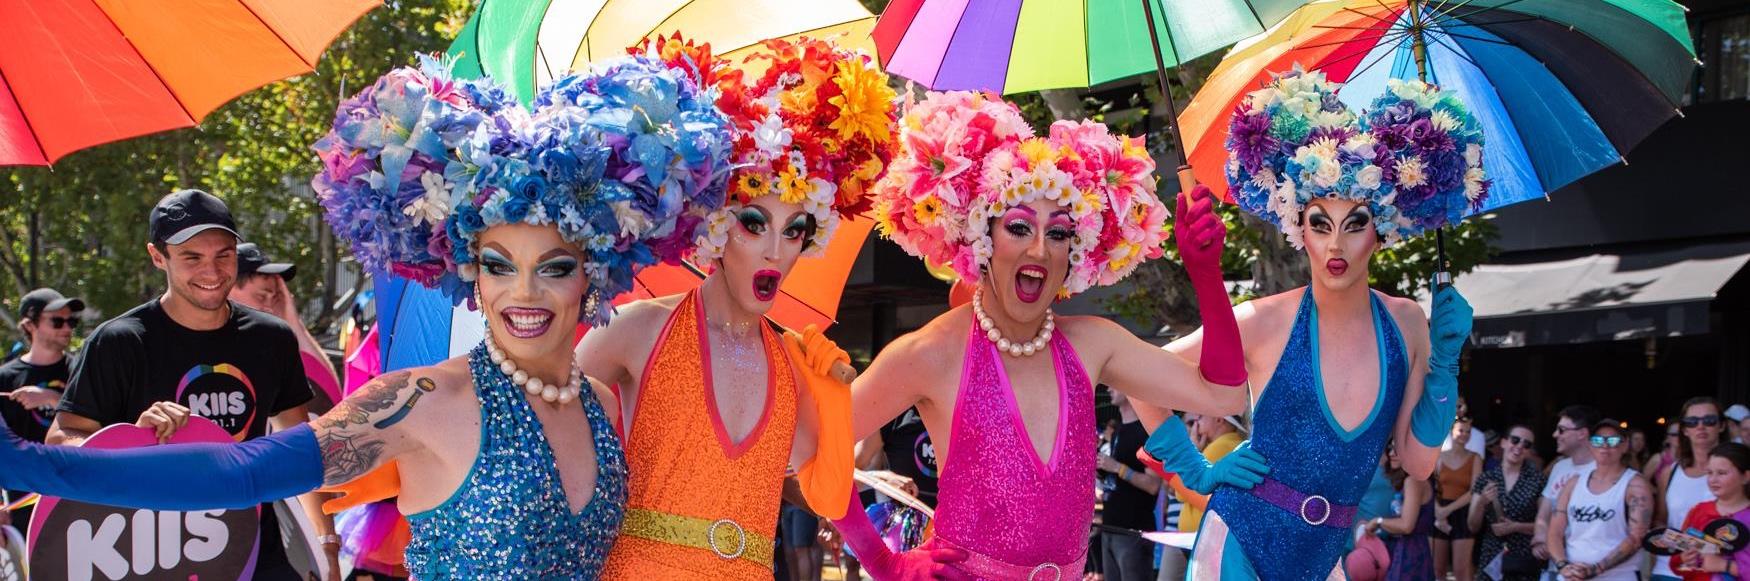 Art_Simone_Melbourne_Drag_Queen_Hire_Appearance_Melbourne_Victoria_Australia_Melb_Makeover_Transformation_Priscilla_Queen_of_the_dessert_the_musical_Rainbow_Hire_performer_show_AAMI_INSURANCE_QUEENS_RUPAUL